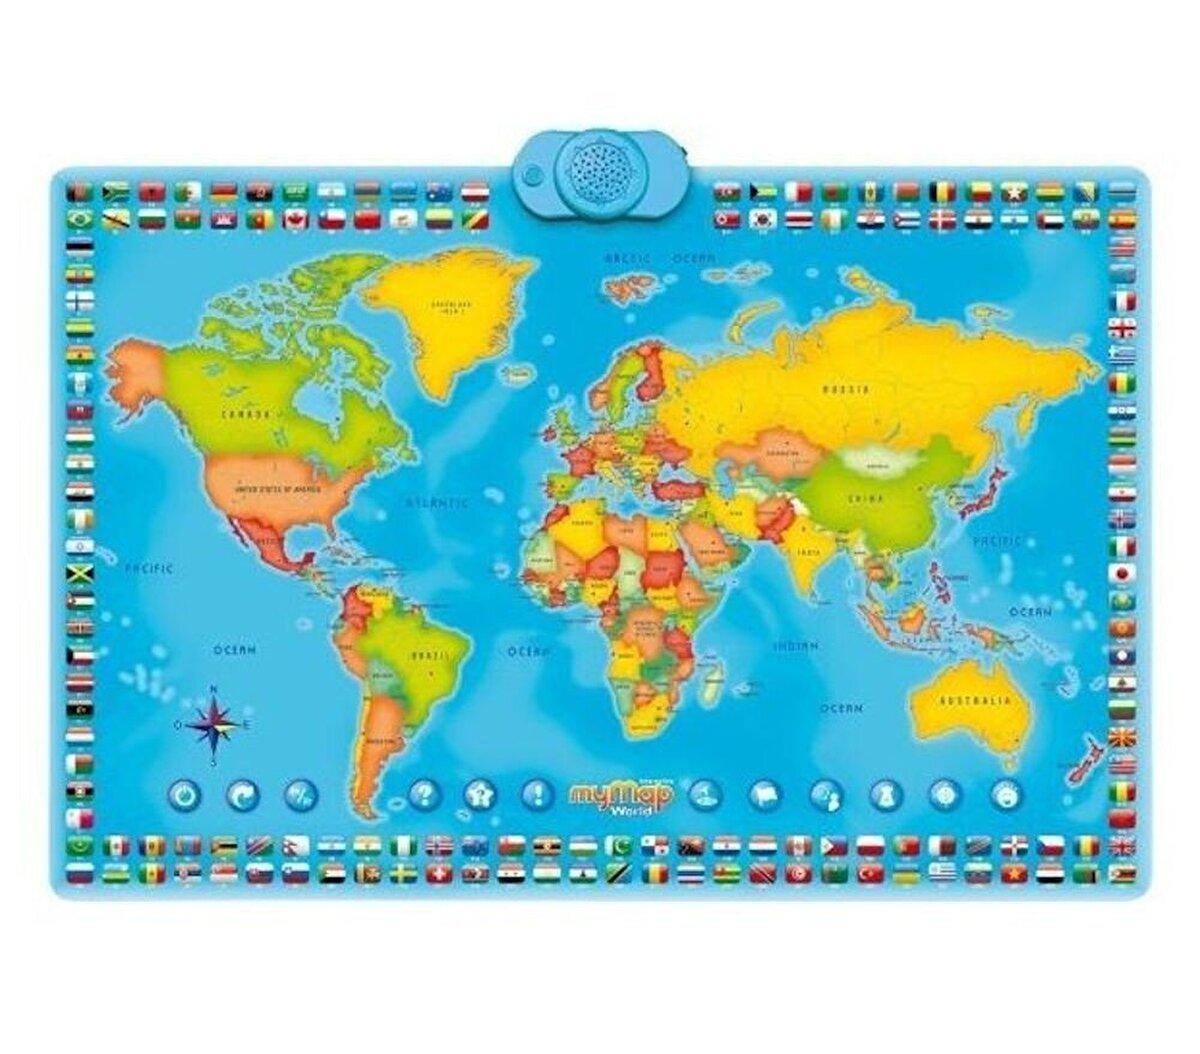 Harta interactiva a lumii, bilingva